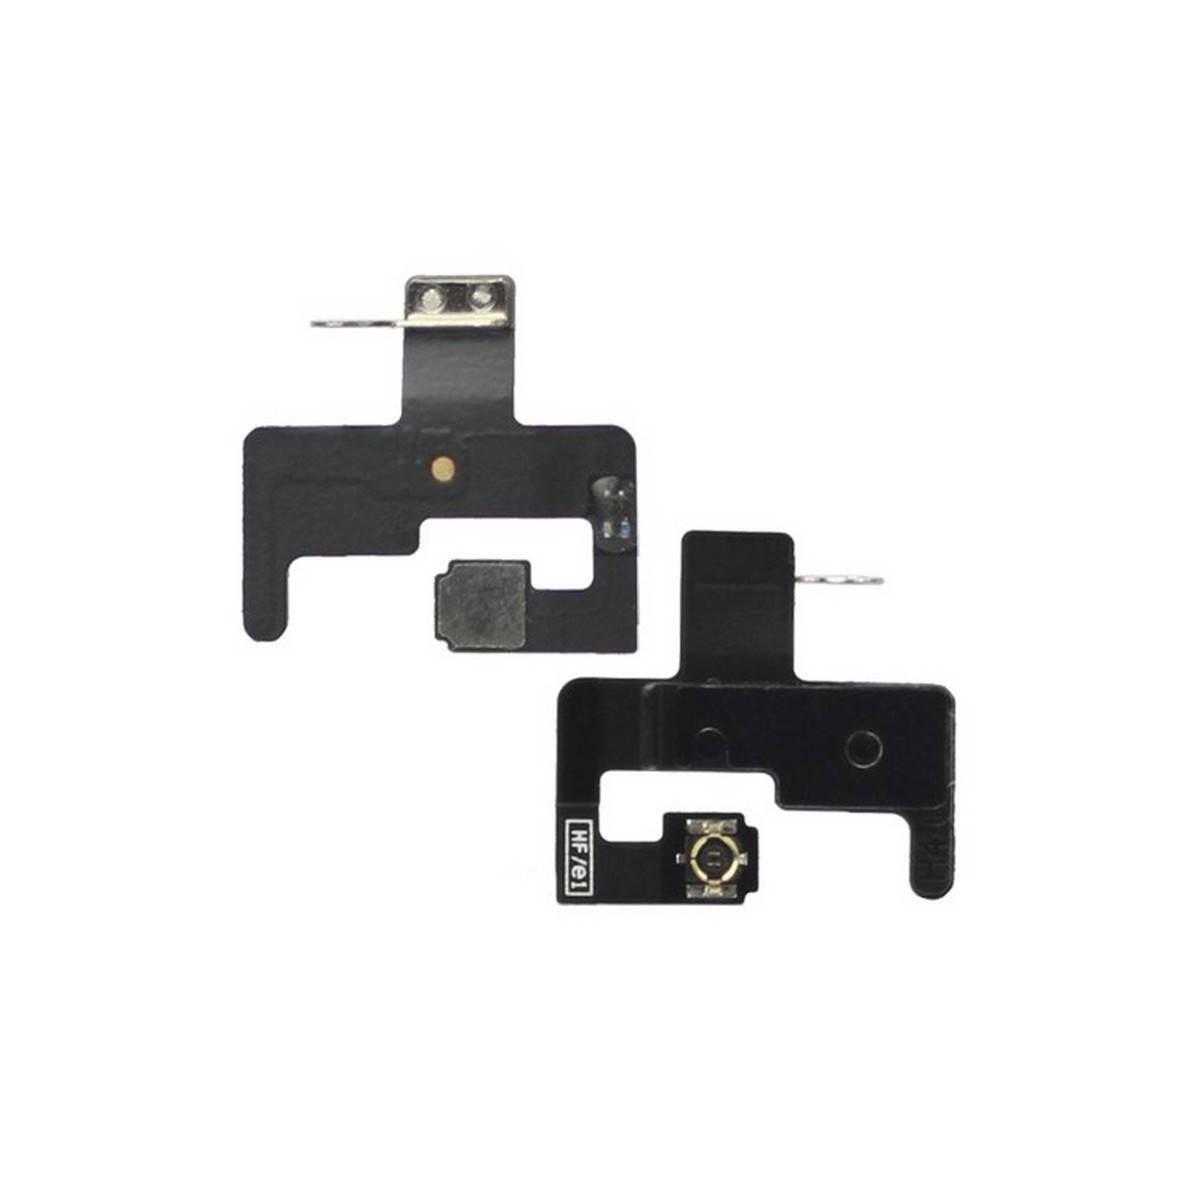 Cabo flex antena Wifi para Iphone 4s